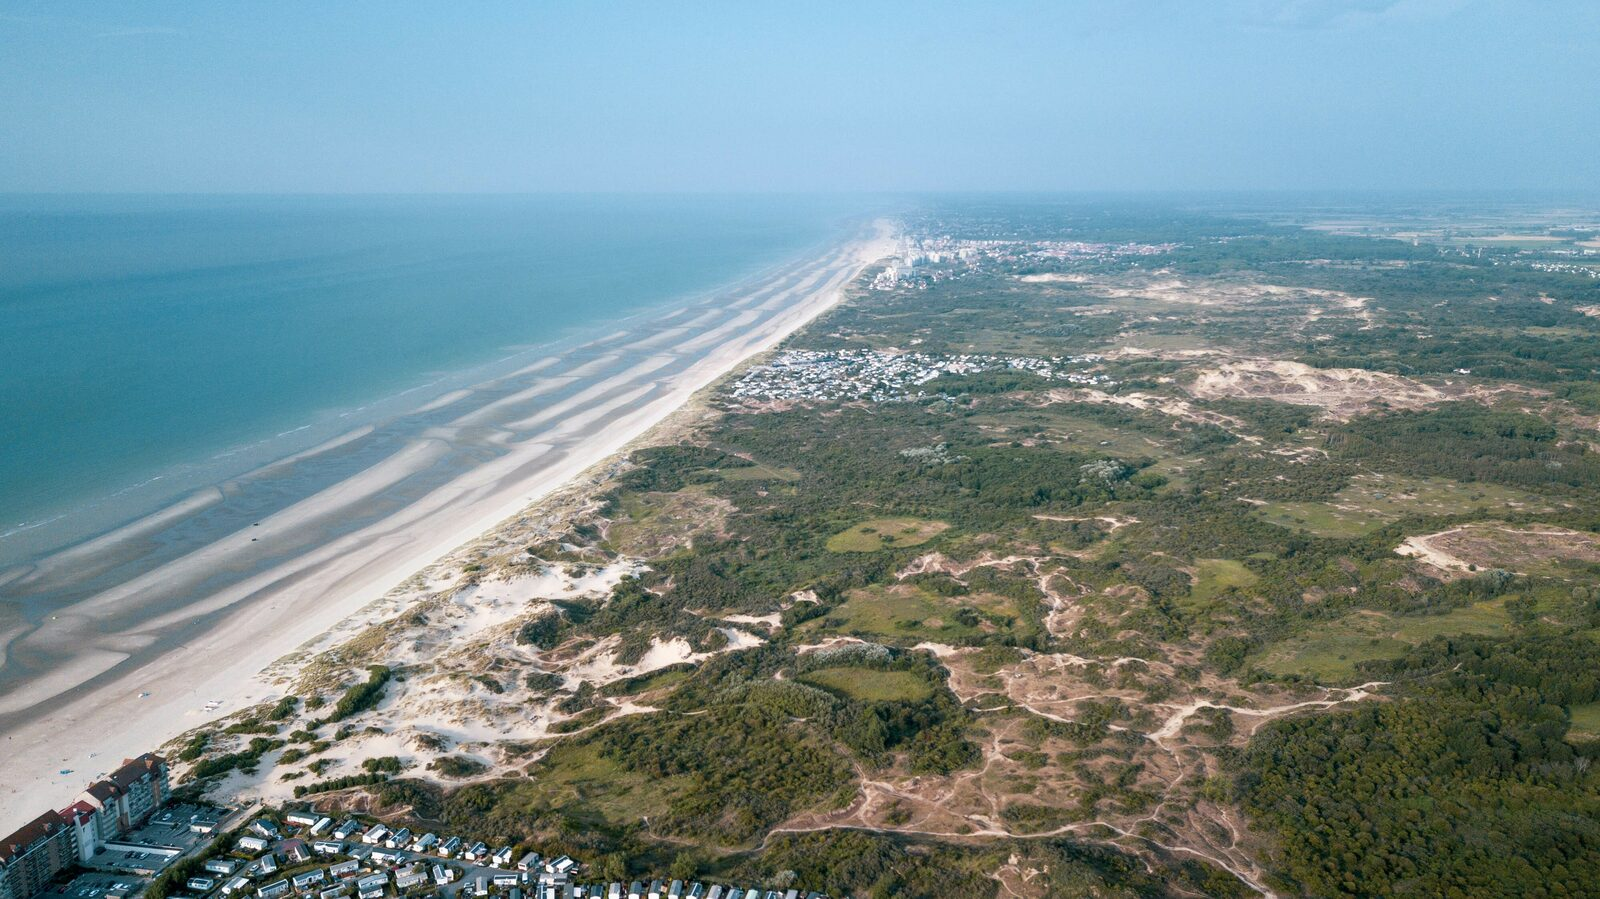 Bray-Dunes Etoile des Dunes